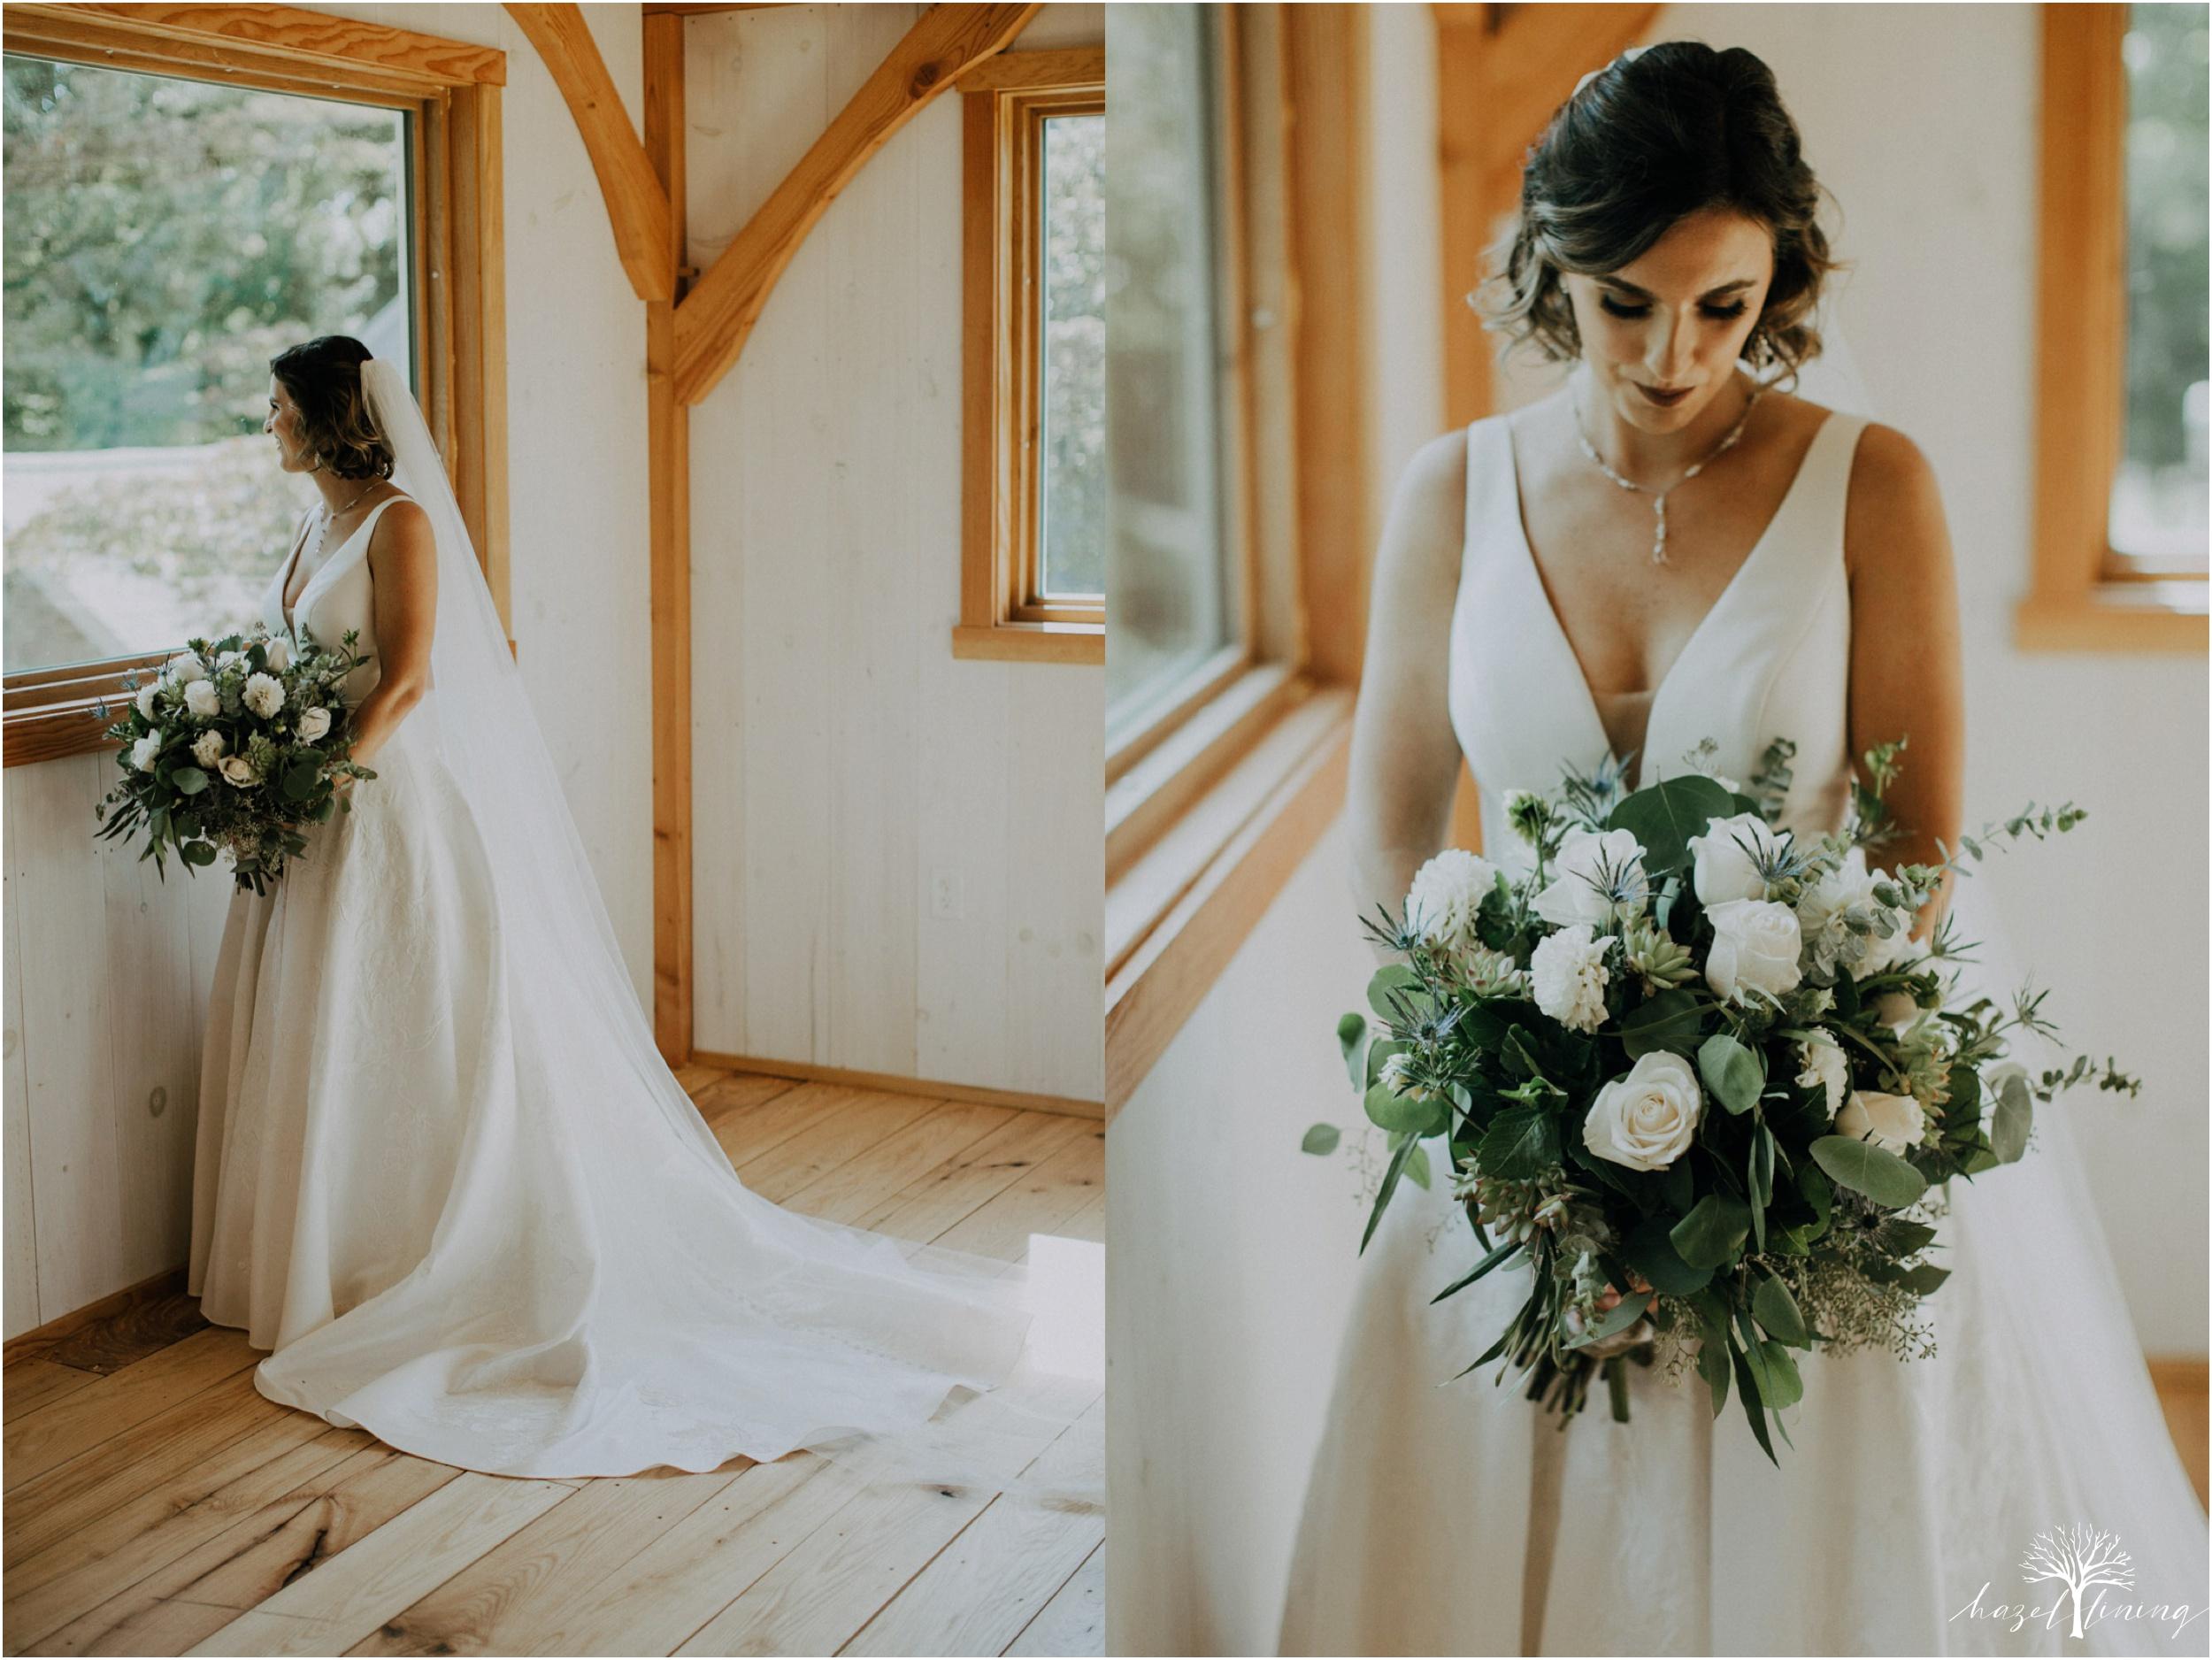 maureen-hepner-anthony-giordano-rose-bank-winery-newtow-pennsylvania-luxury-summer-wedding-hazel-lining-photography-destination-elopement-wedding-engagement-photography_0026.jpg